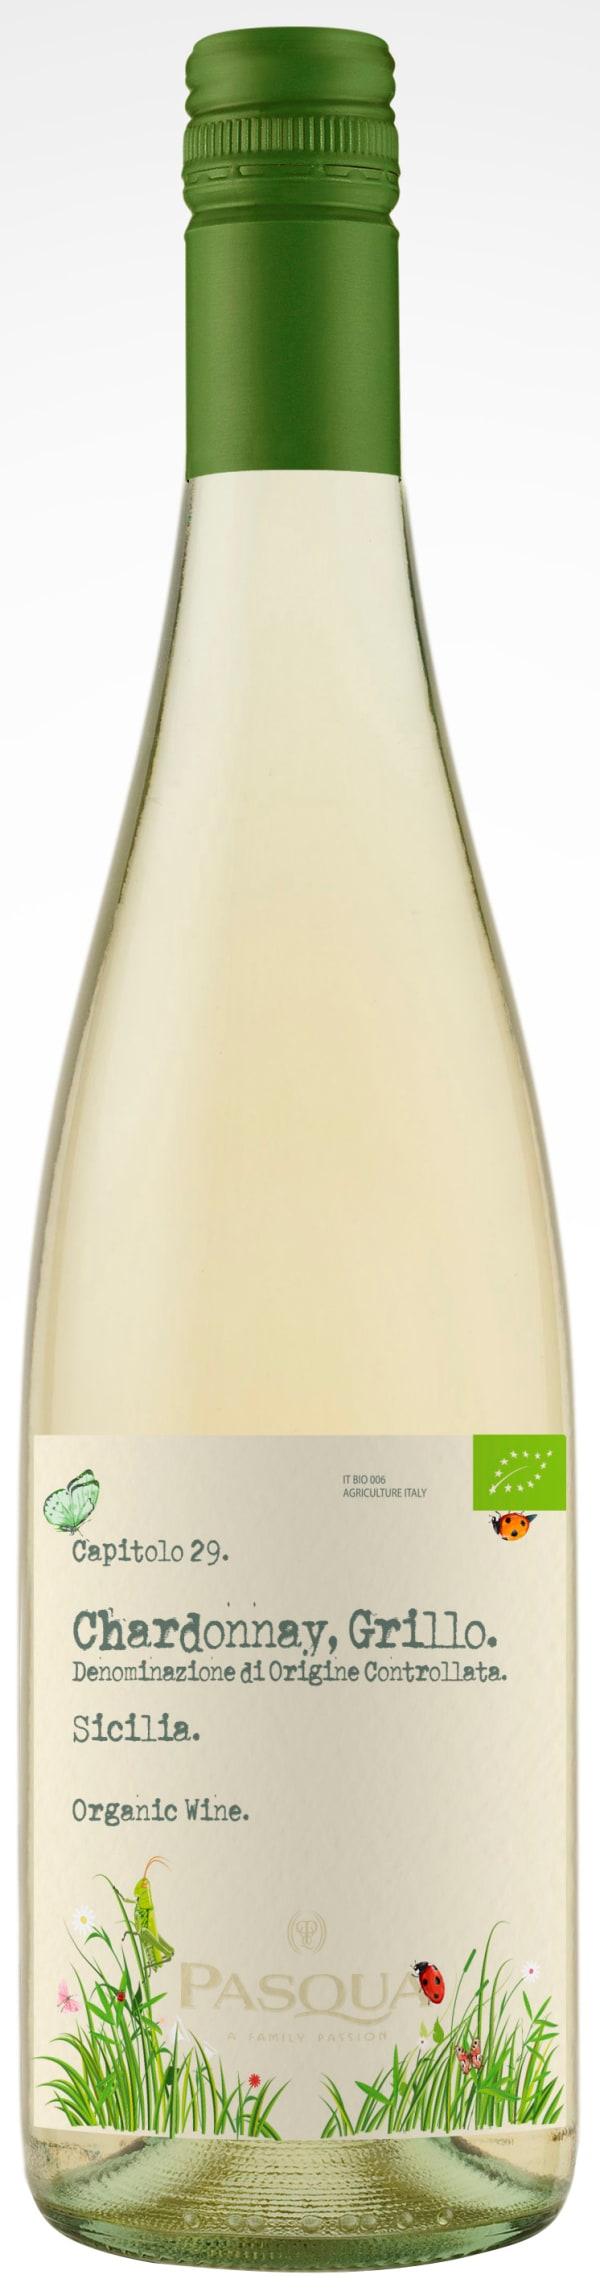 Pasqua Chardonnay Grillo Organic 2018